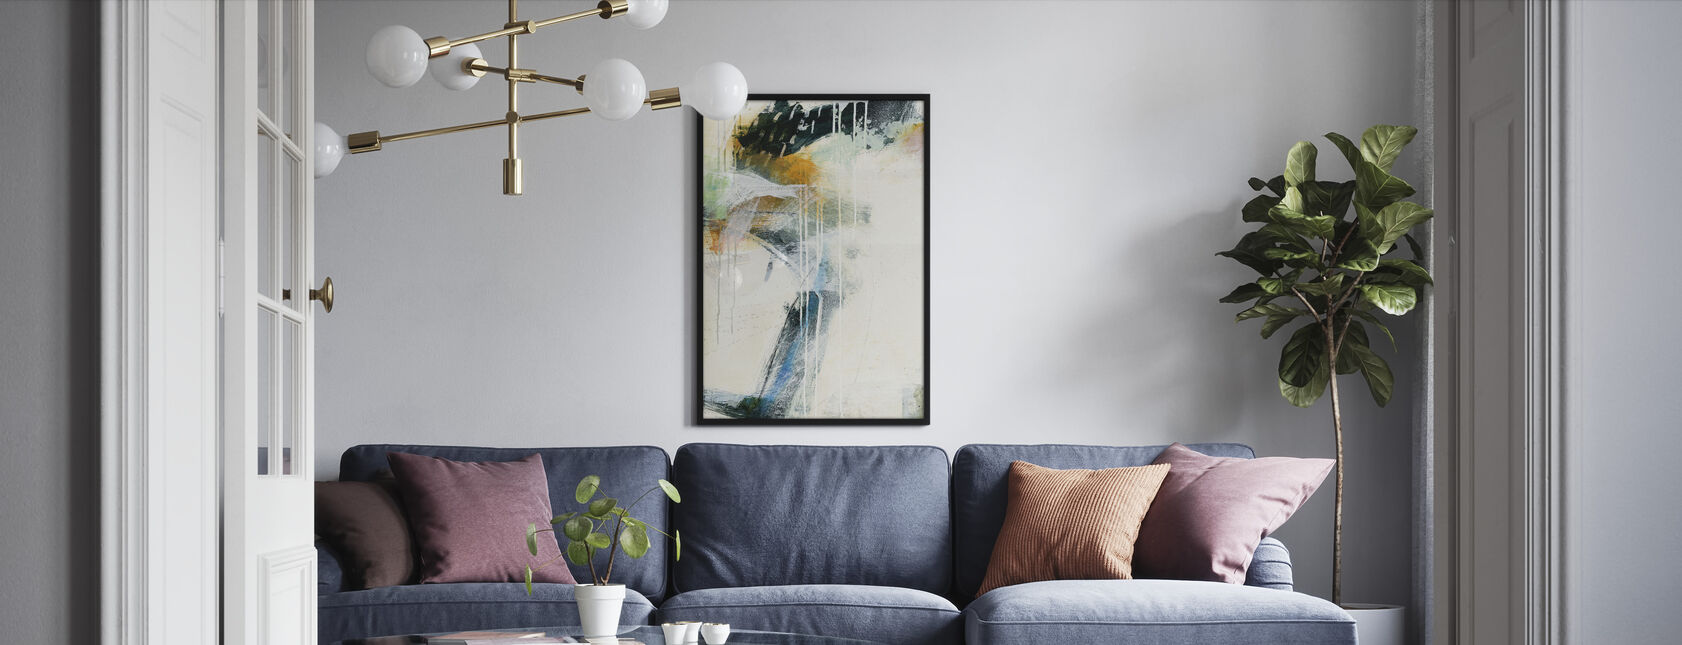 Turbulenz II - Gerahmtes bild - Wohnzimmer